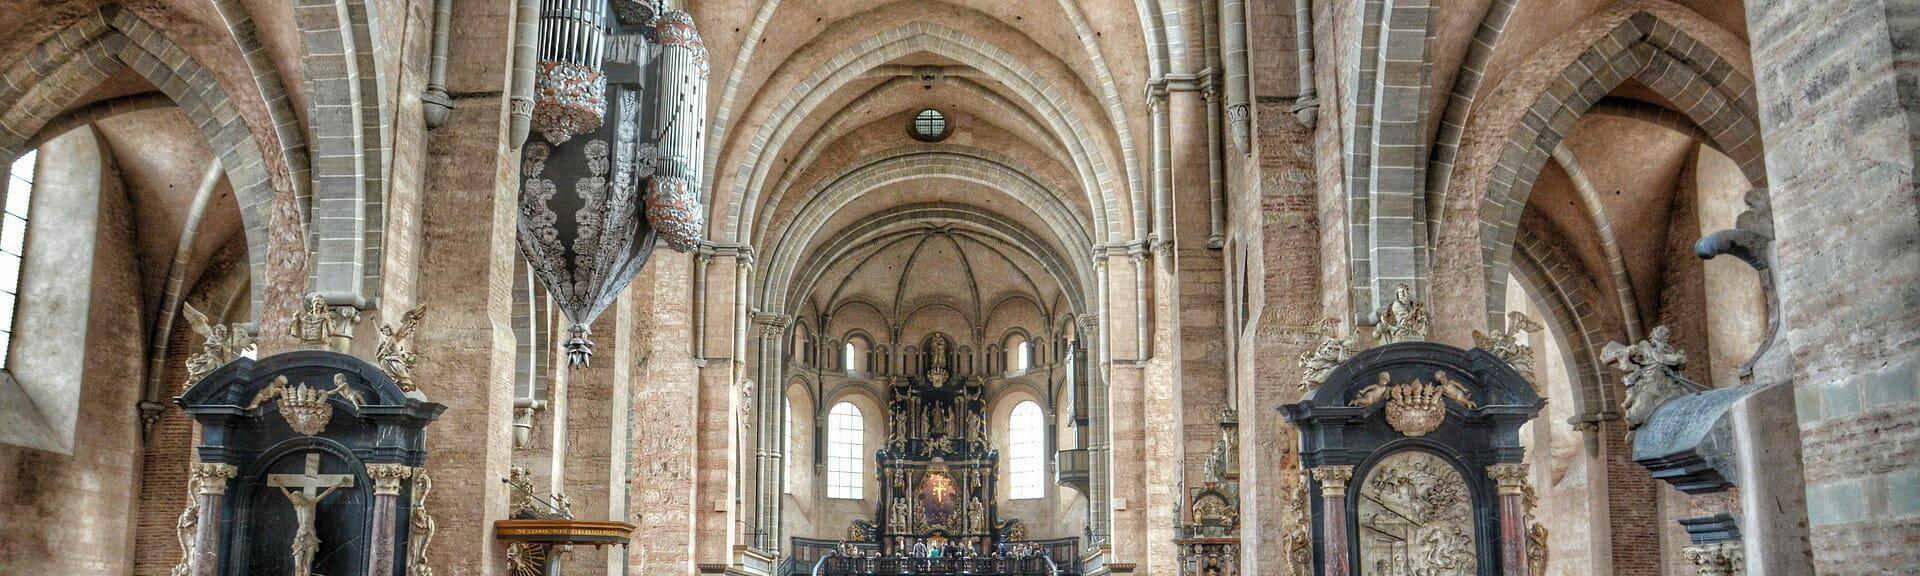 Klassenfahrt Trier Im Dom St. Petrus